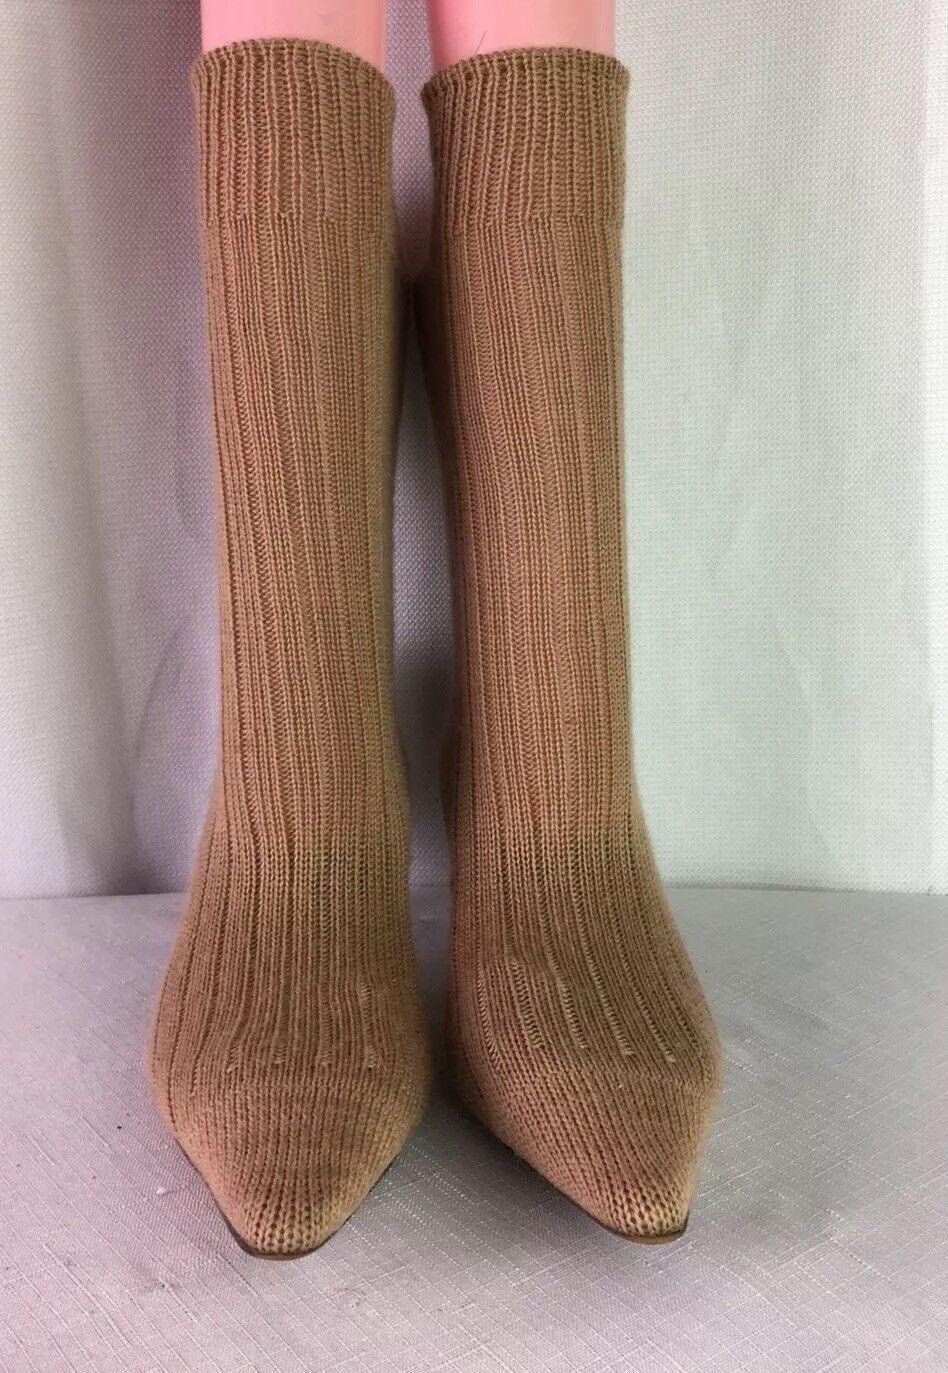 Paul Smith femmes For Emma Hope,Tan,Knit Sock  Leather Ankle démarrage SZ 35 1 2-U S 5